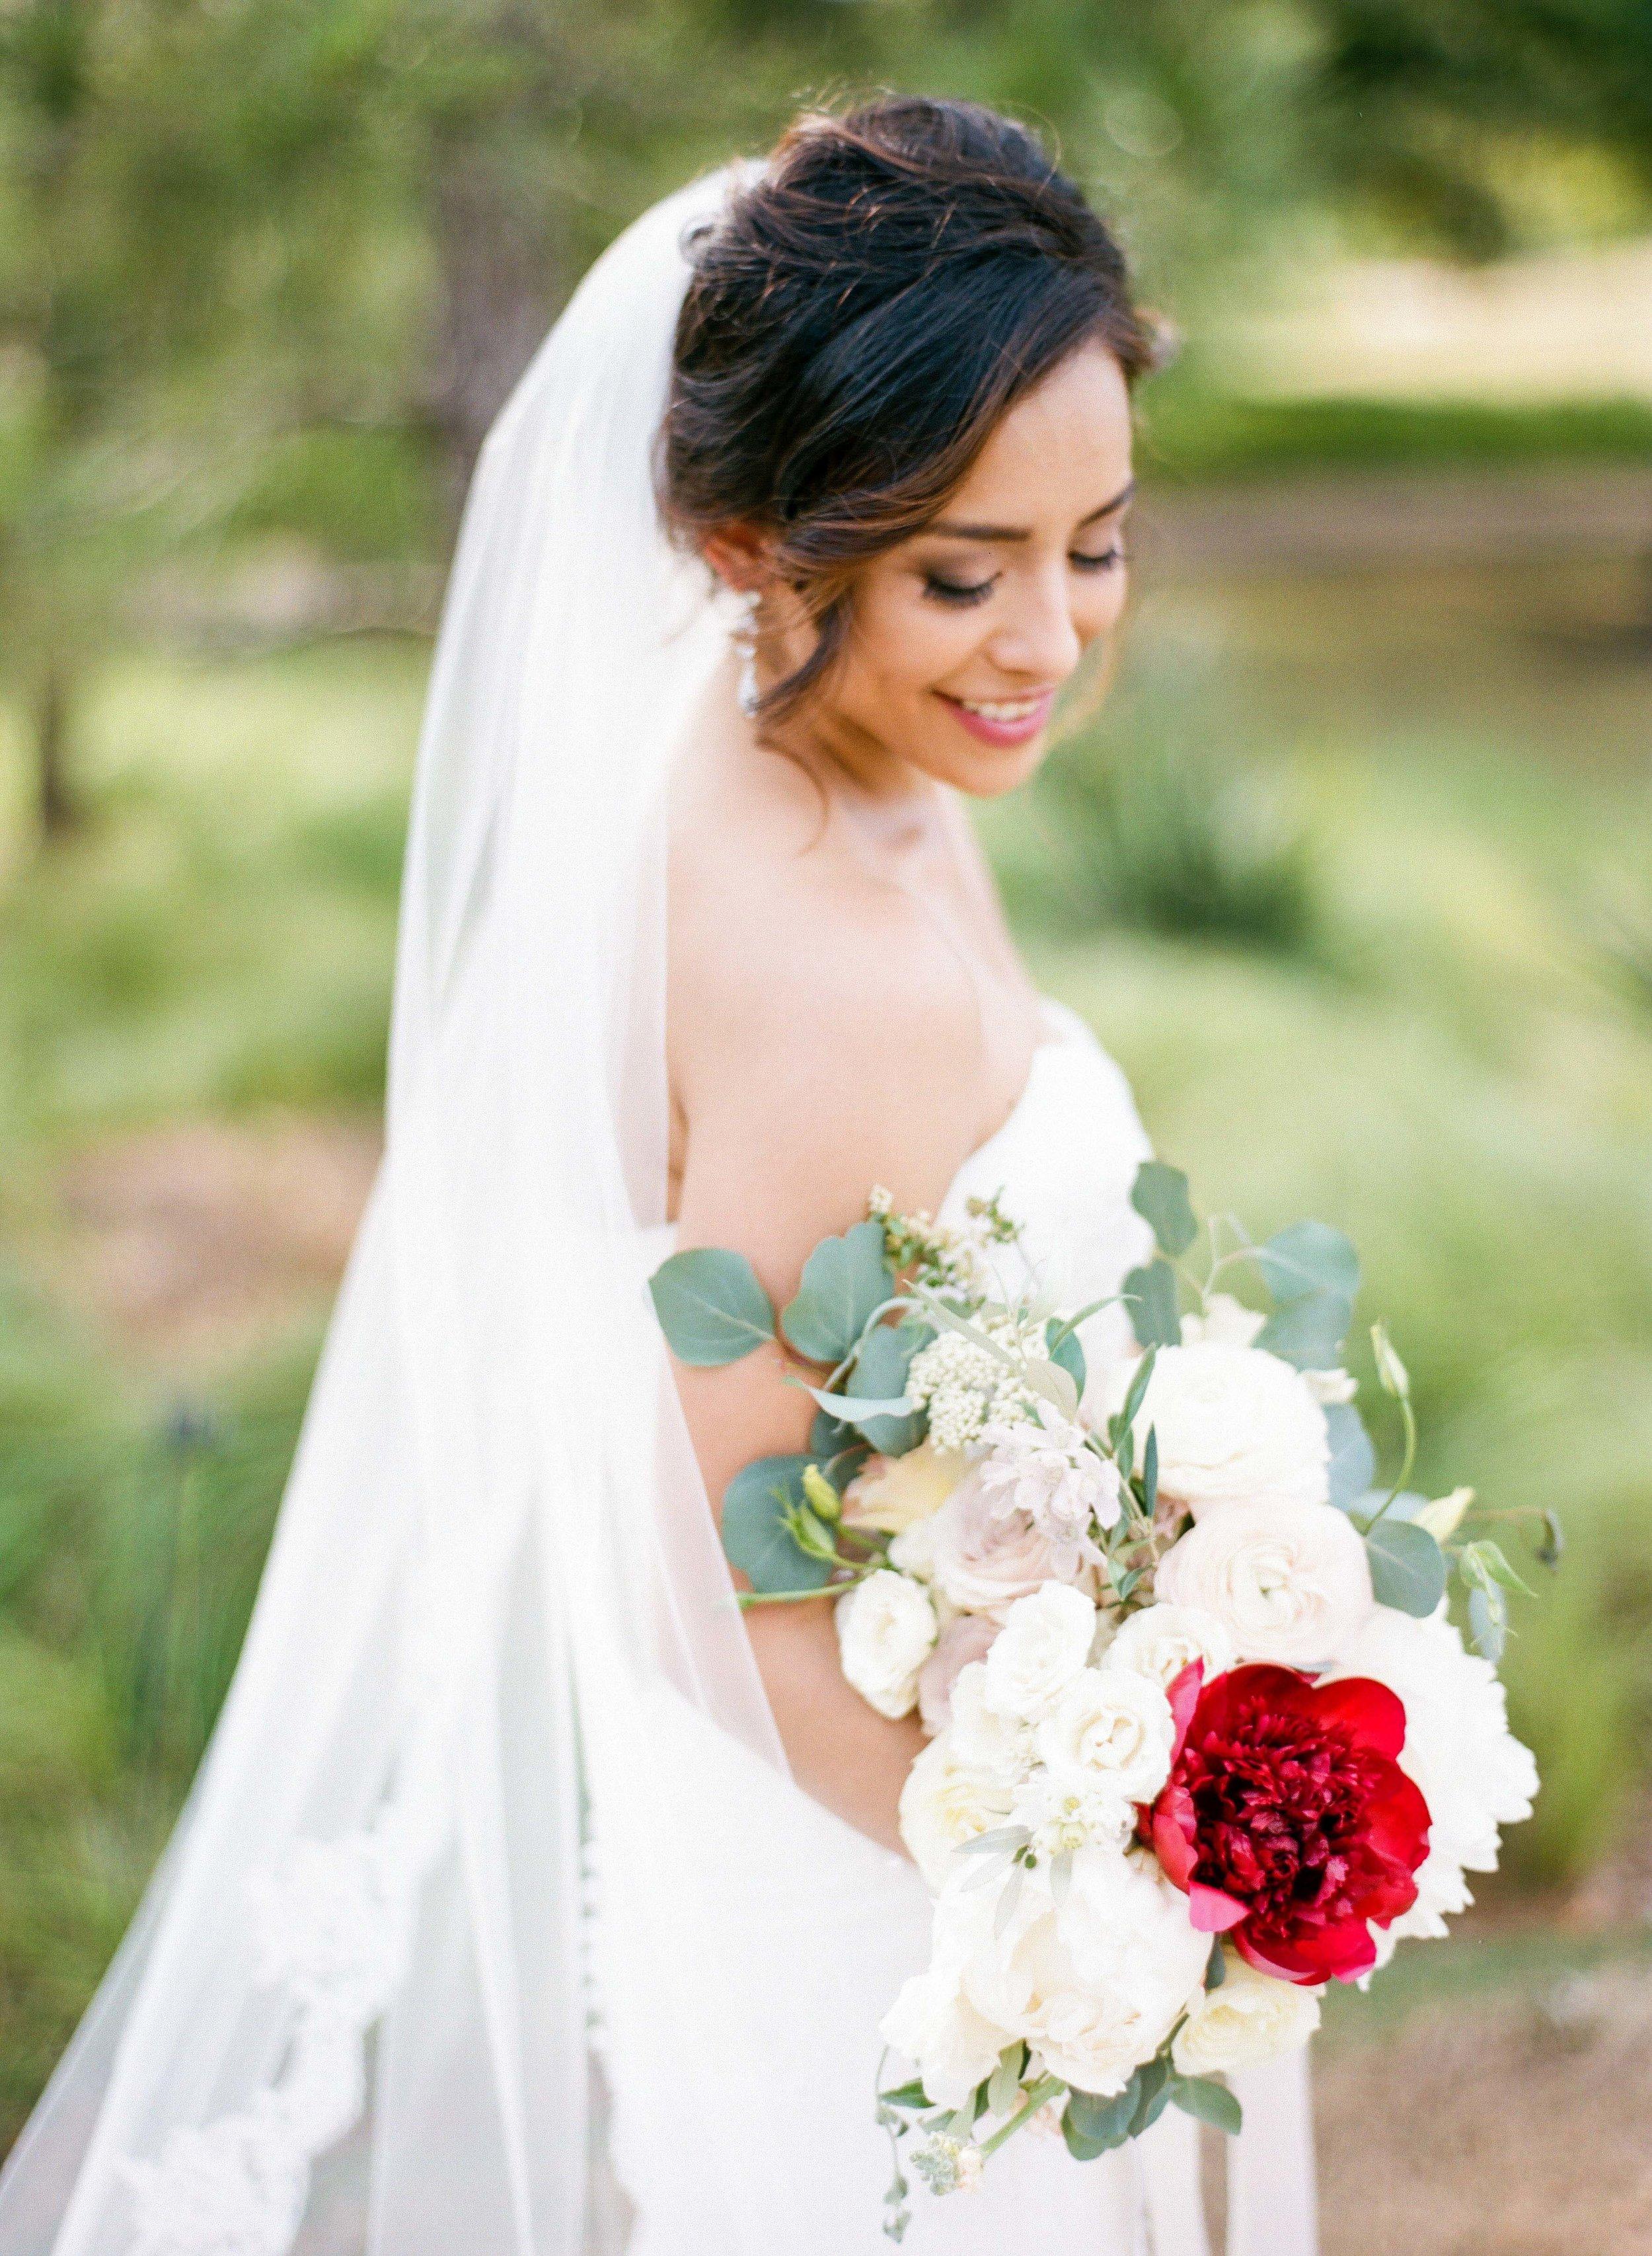 Houston-Wedding-Photography-St.-Anne-Catholic-Church-Houston-Wedding-The-Bell-Tower-on-34th-reception-wedding-film-15.jpg